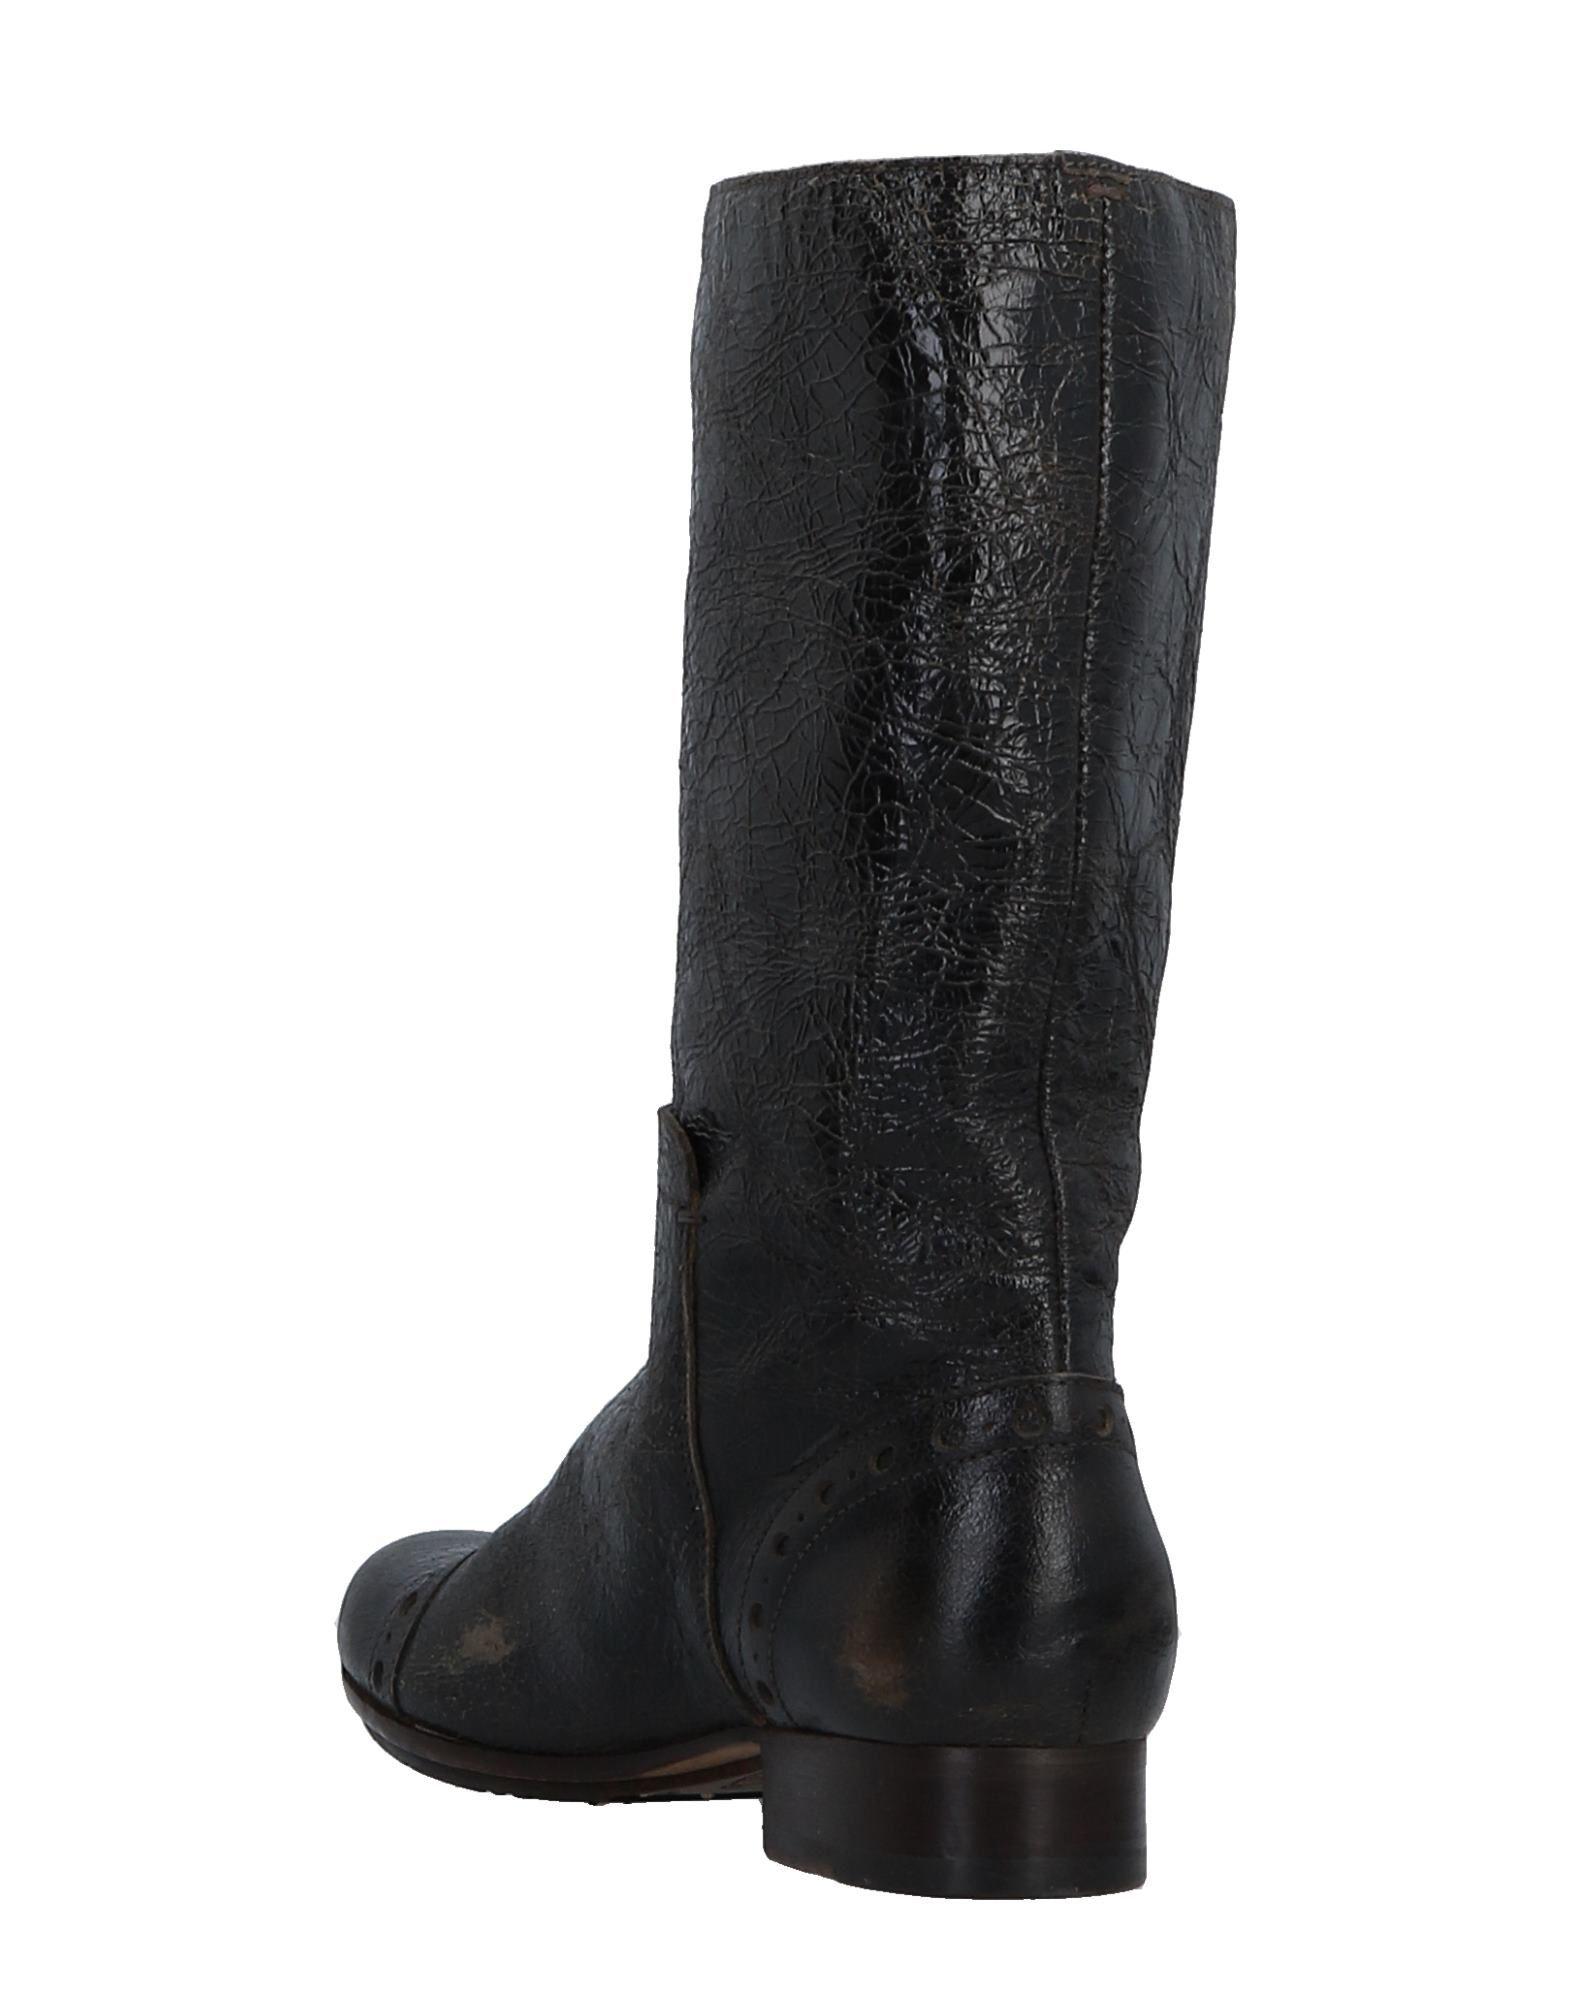 Pantanetti Stiefel Damen  11512662QHGut aussehende strapazierfähige Schuhe